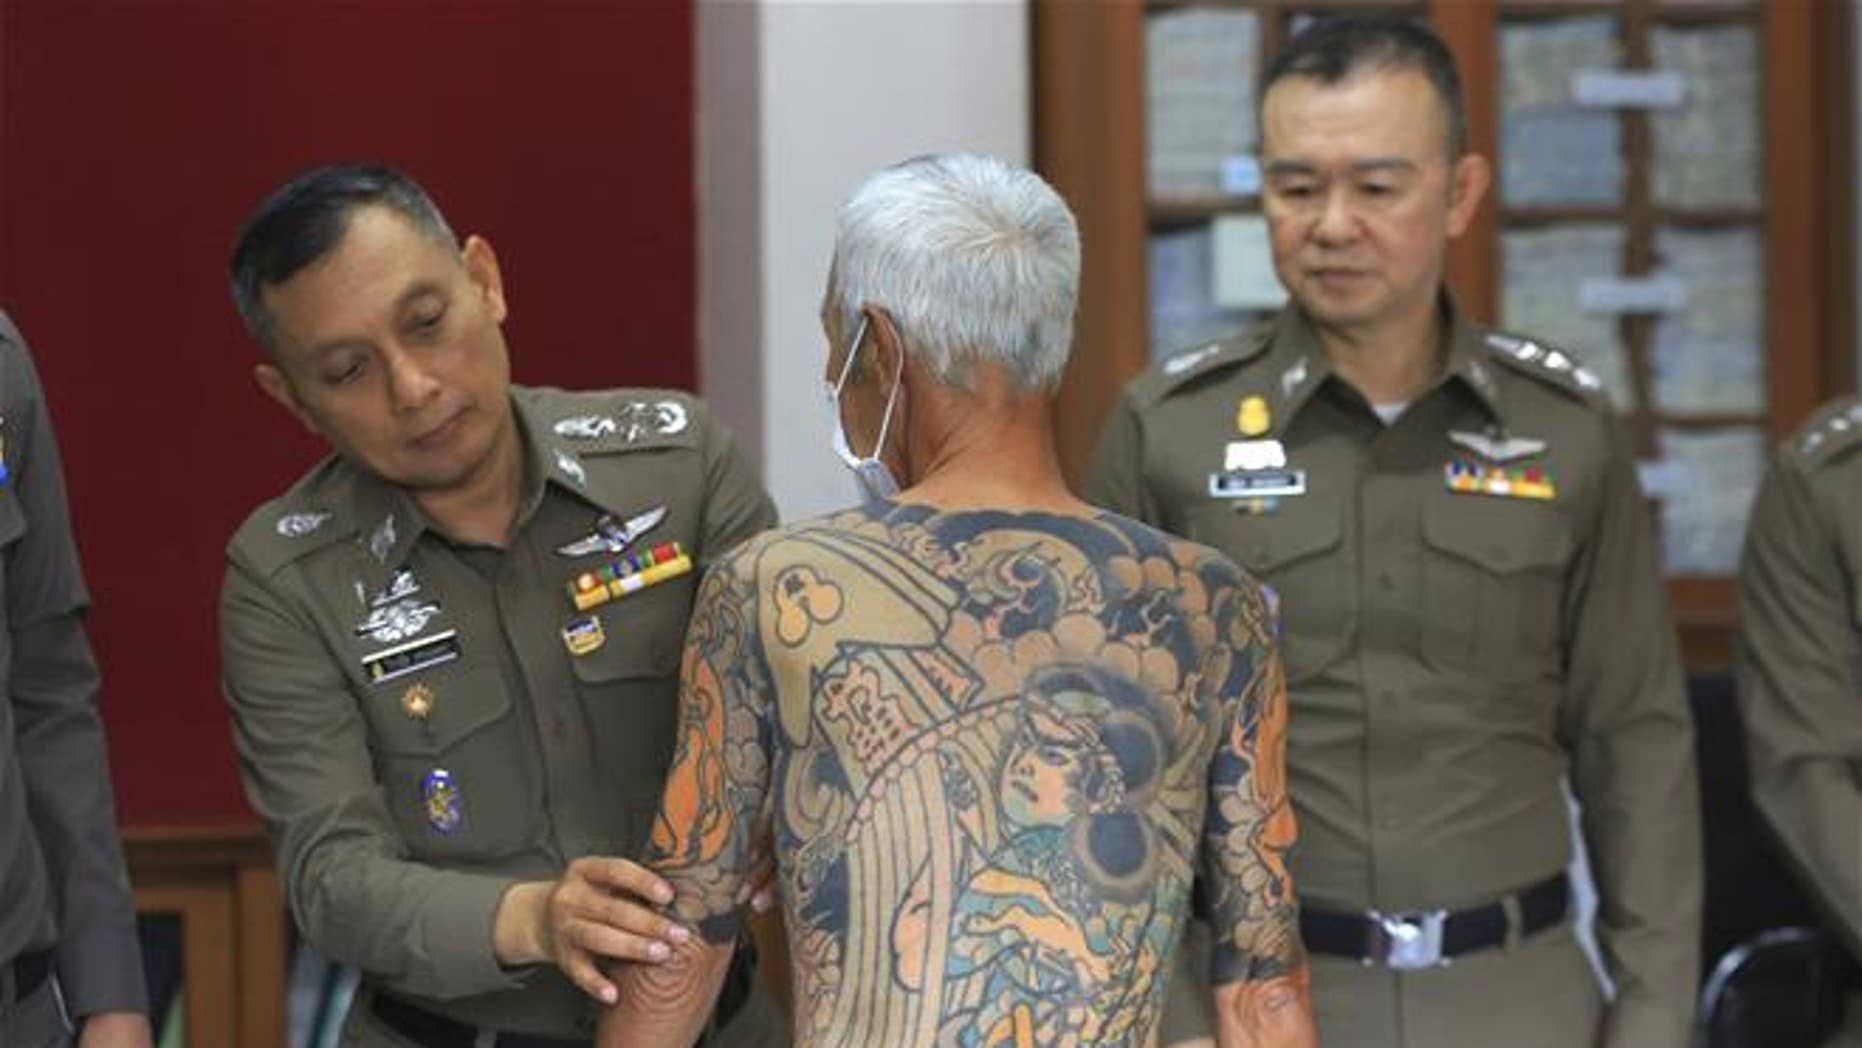 Japanese gang member Shigeharu Shirai displays his tattoos at a police station during a press conference in Lopburi.